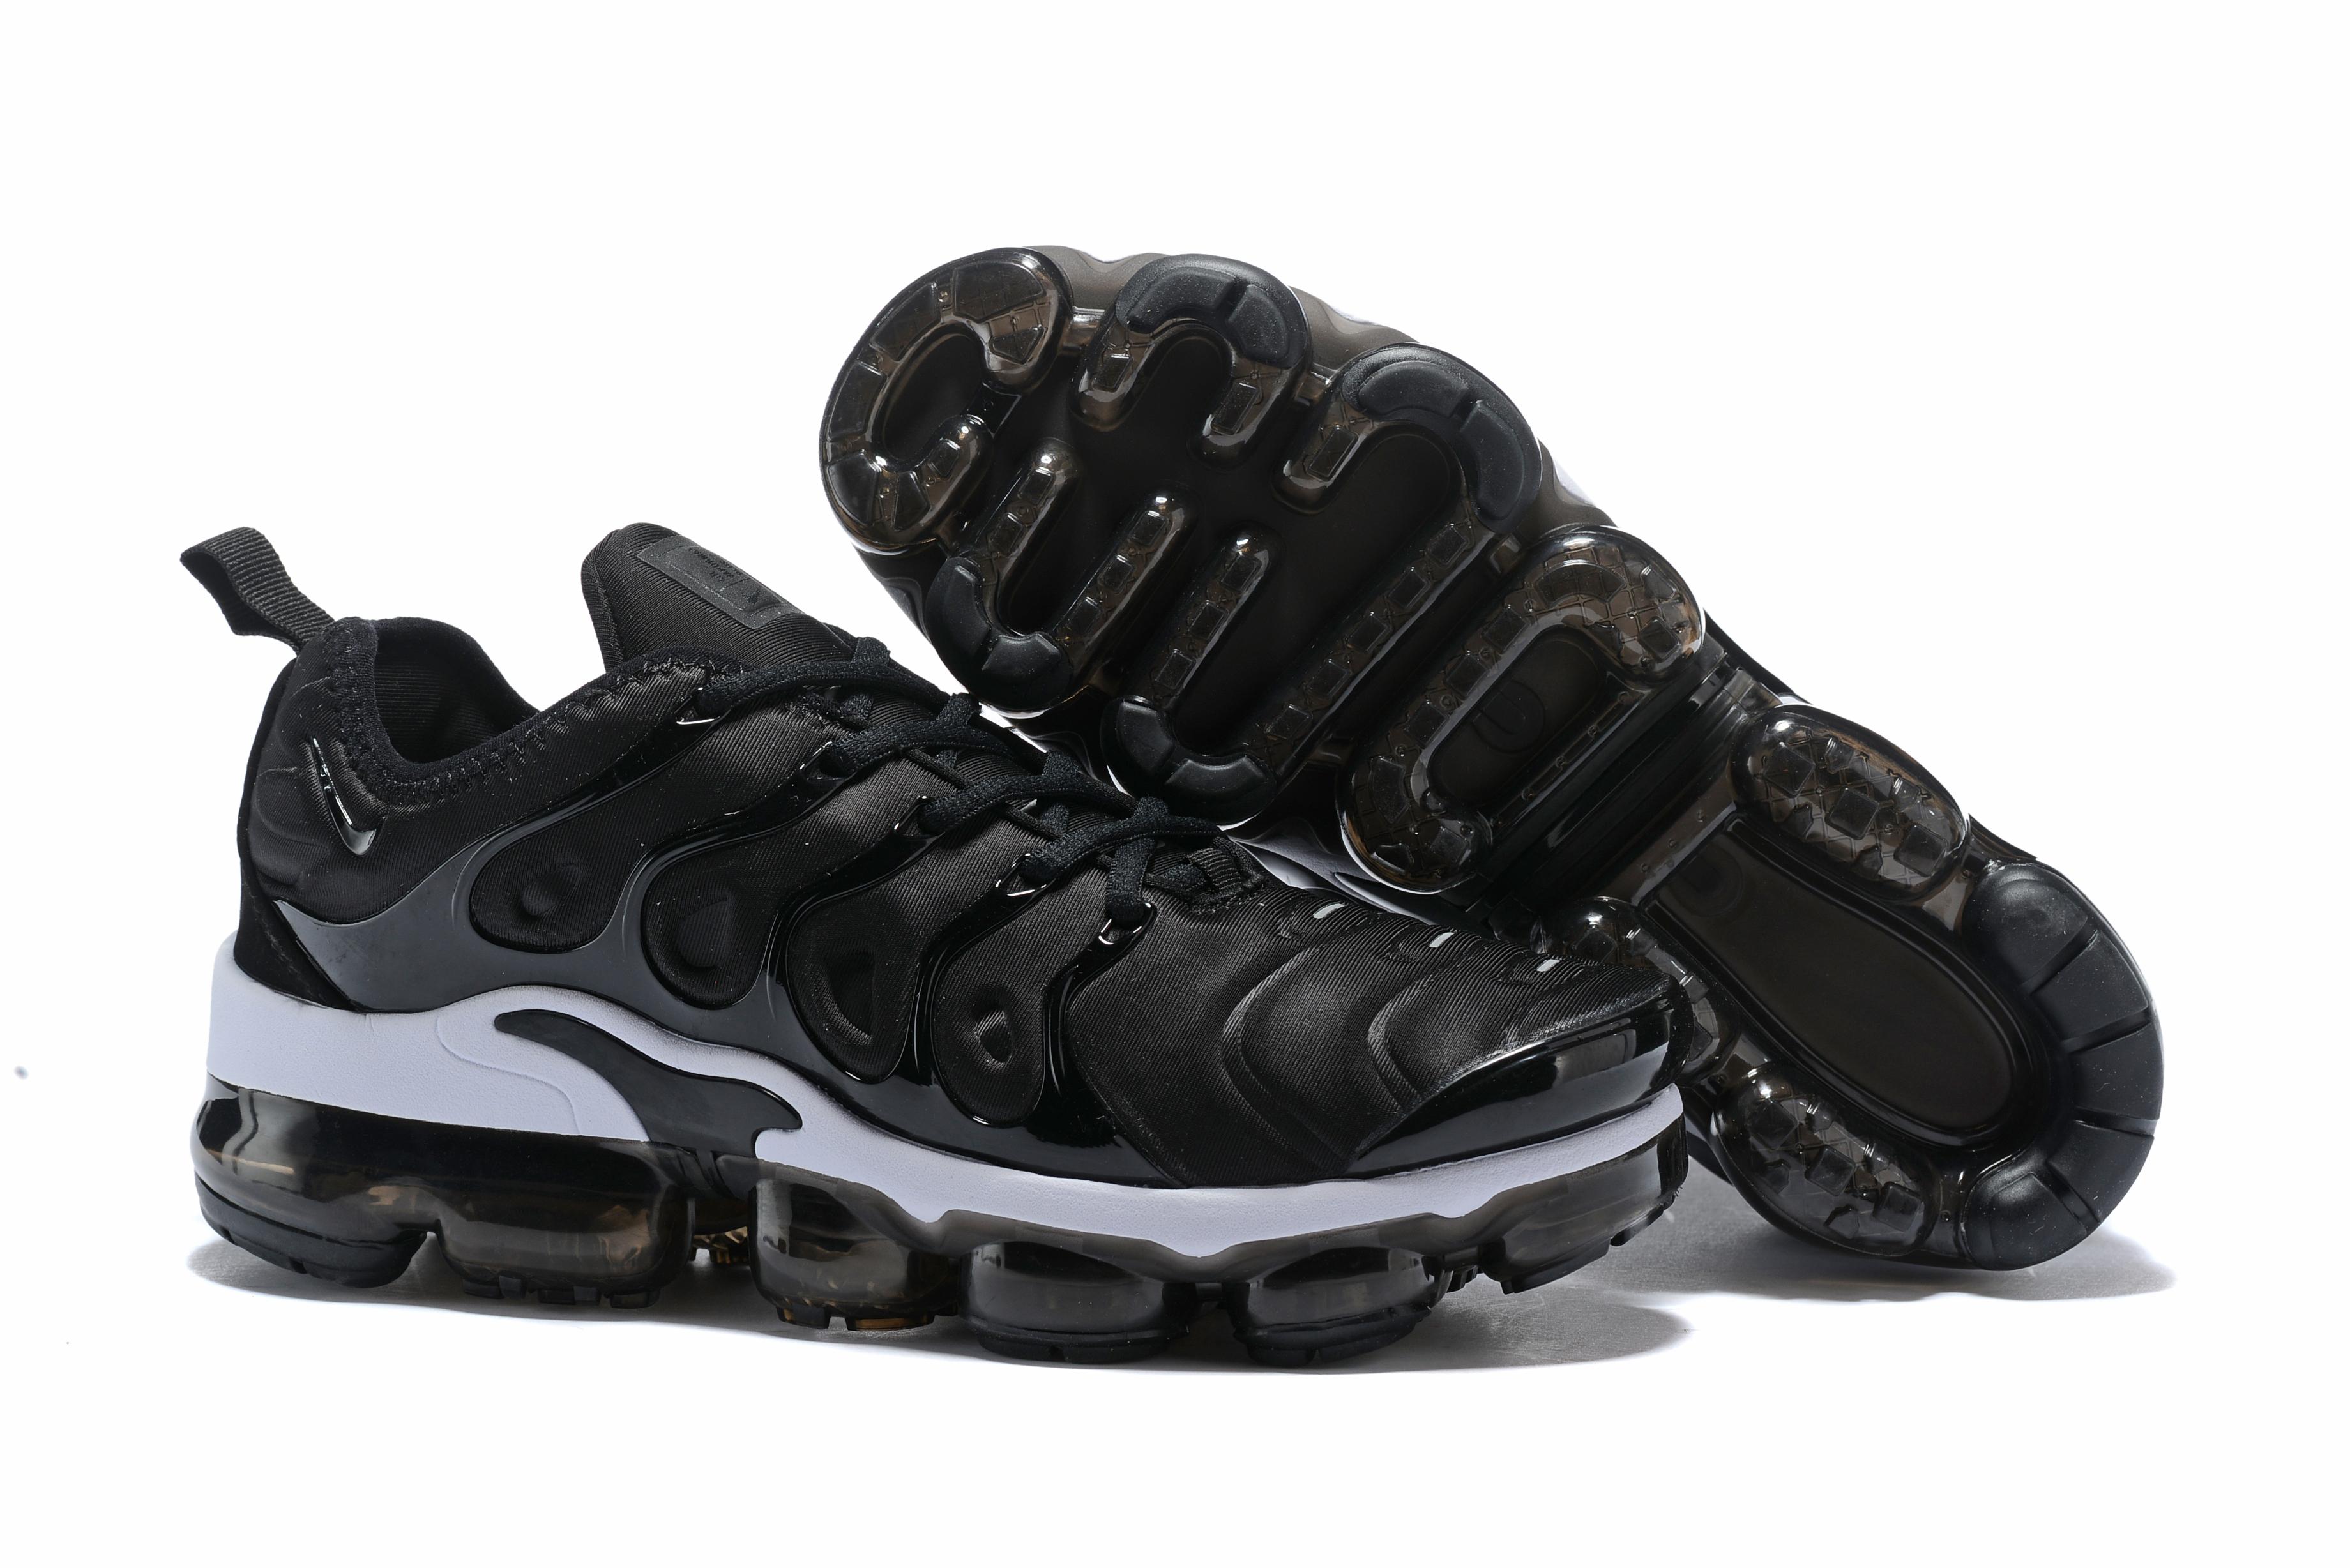 outlet store b93bc 161fd Men s Women s Nike Air Max Plus TN Ultra Shoes Blue Camouflage 898015-023,nike  tn rea nike tn rea. Rea Skor Herr ...